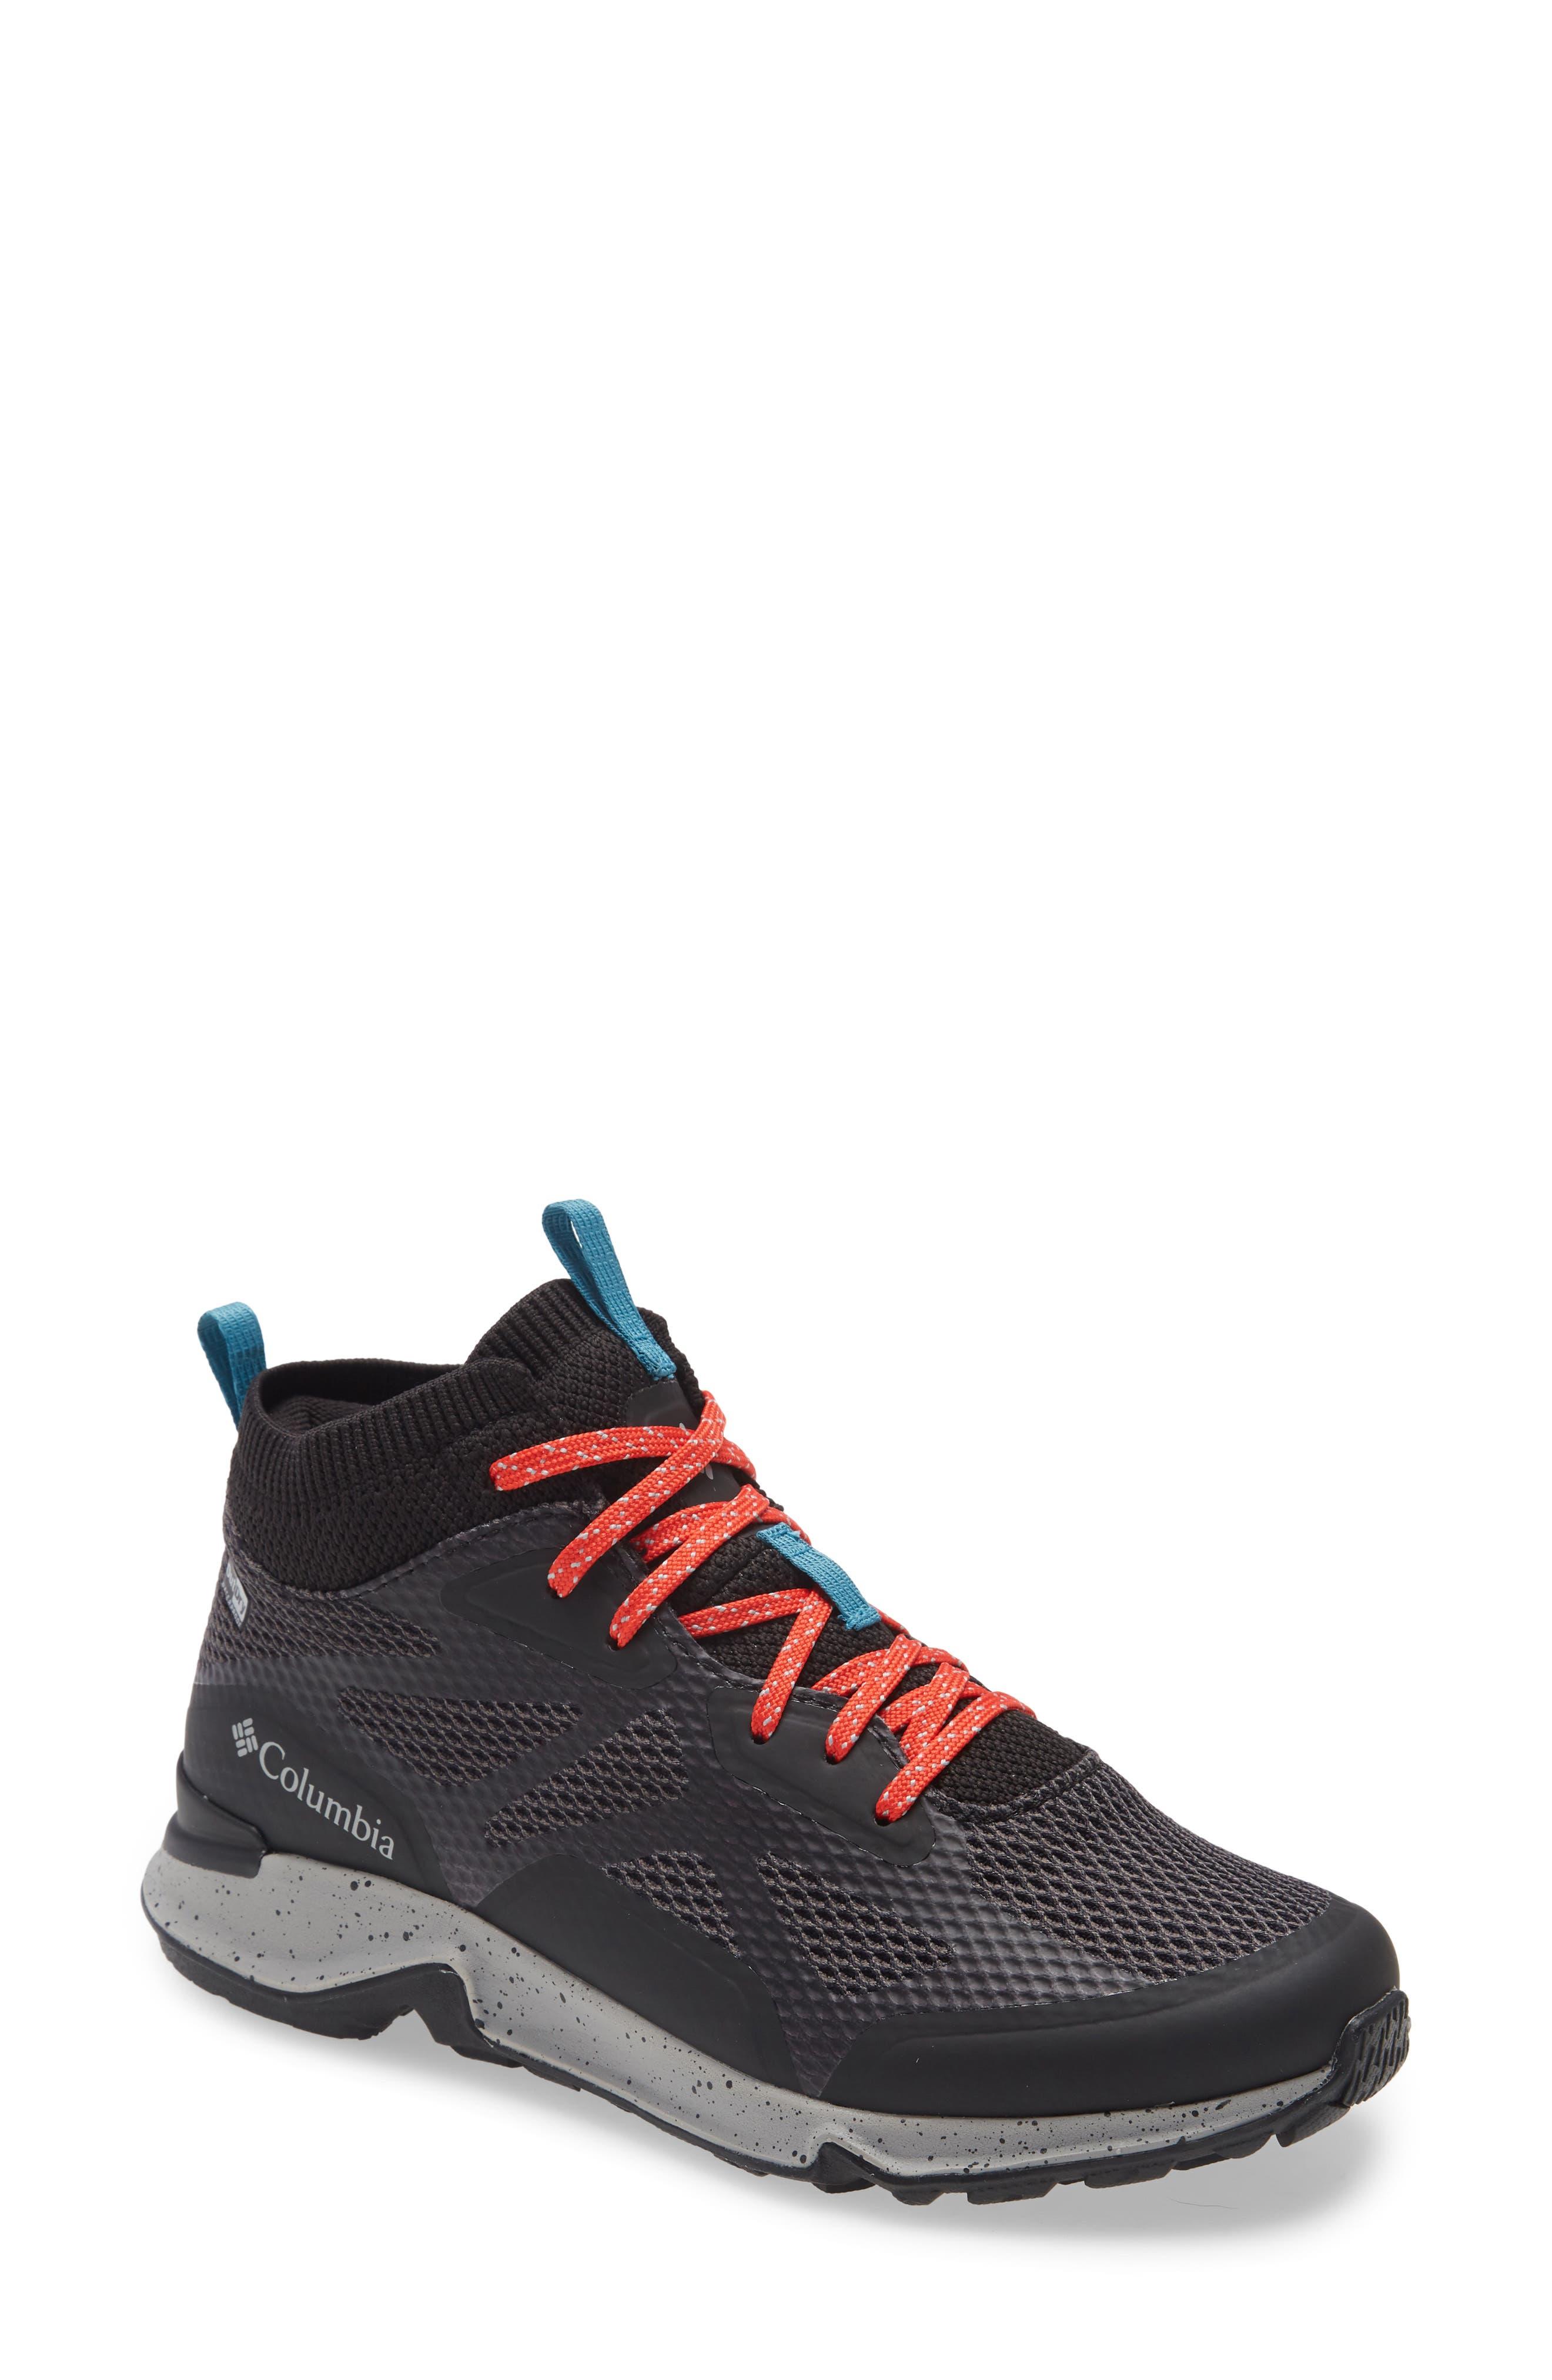 Vitesse(TM) Mid Outdry(TM) Waterproof Hiking Shoe